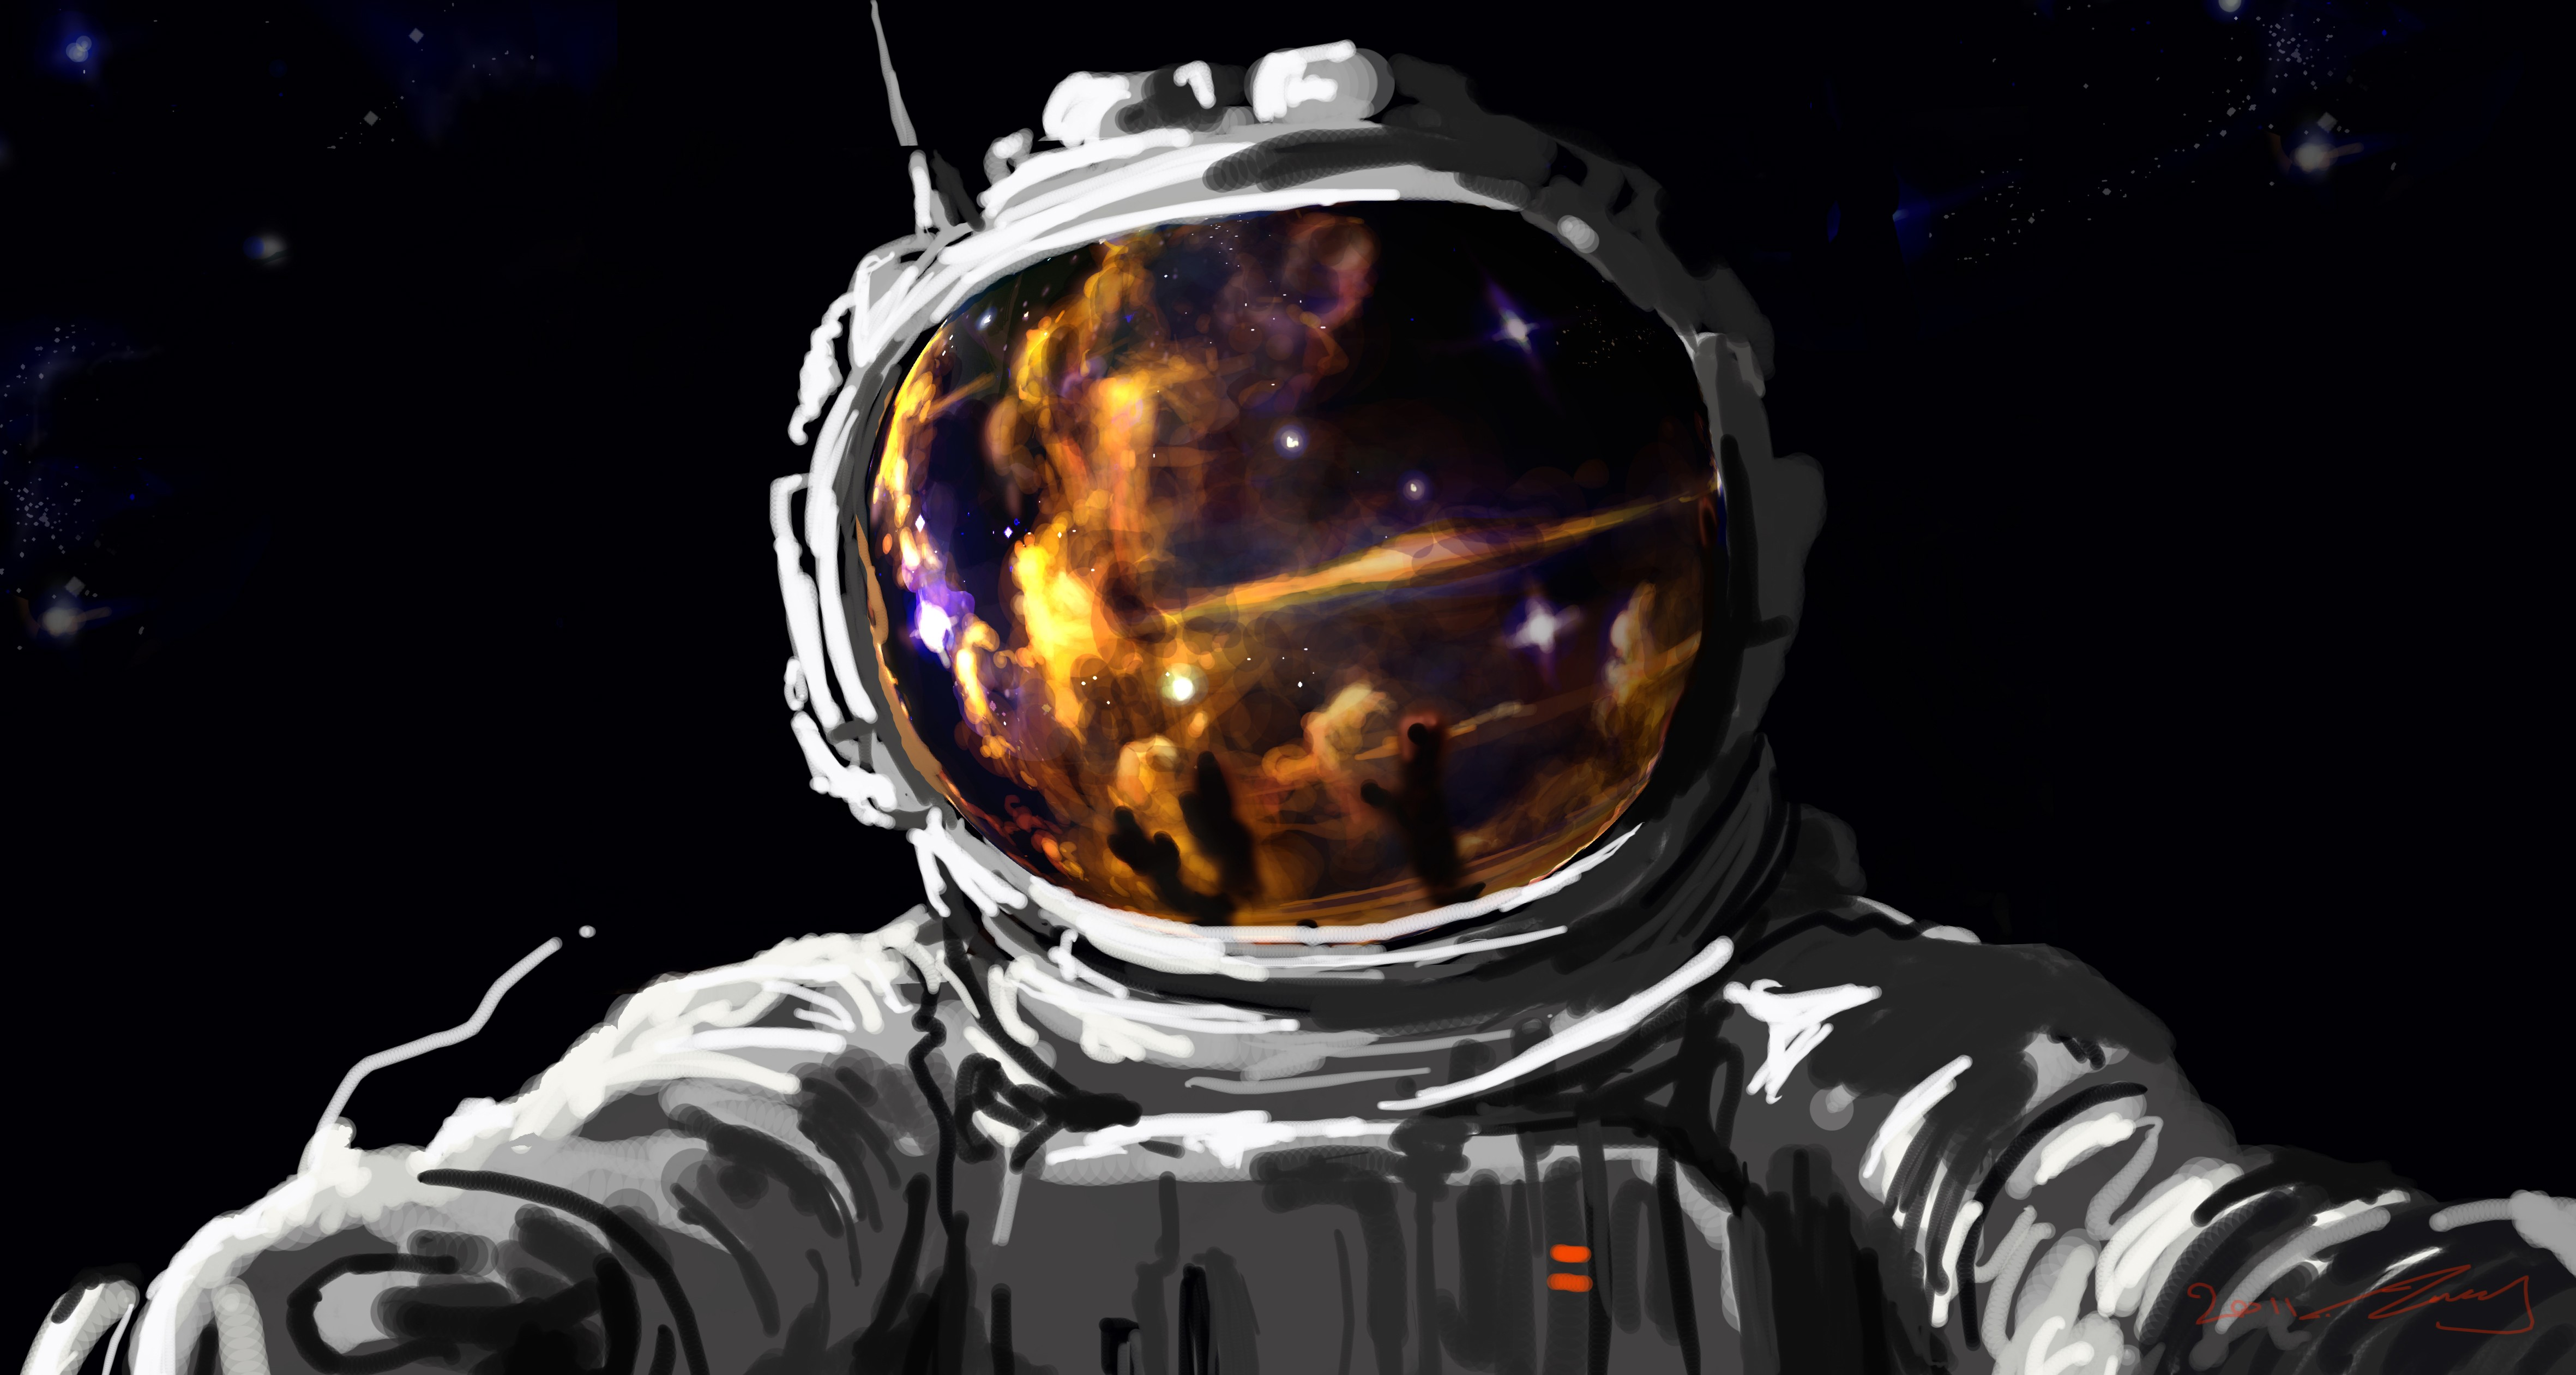 General 4724x2521 artwork fantasy art concept art space astronaut spacesuit stars digital art painting